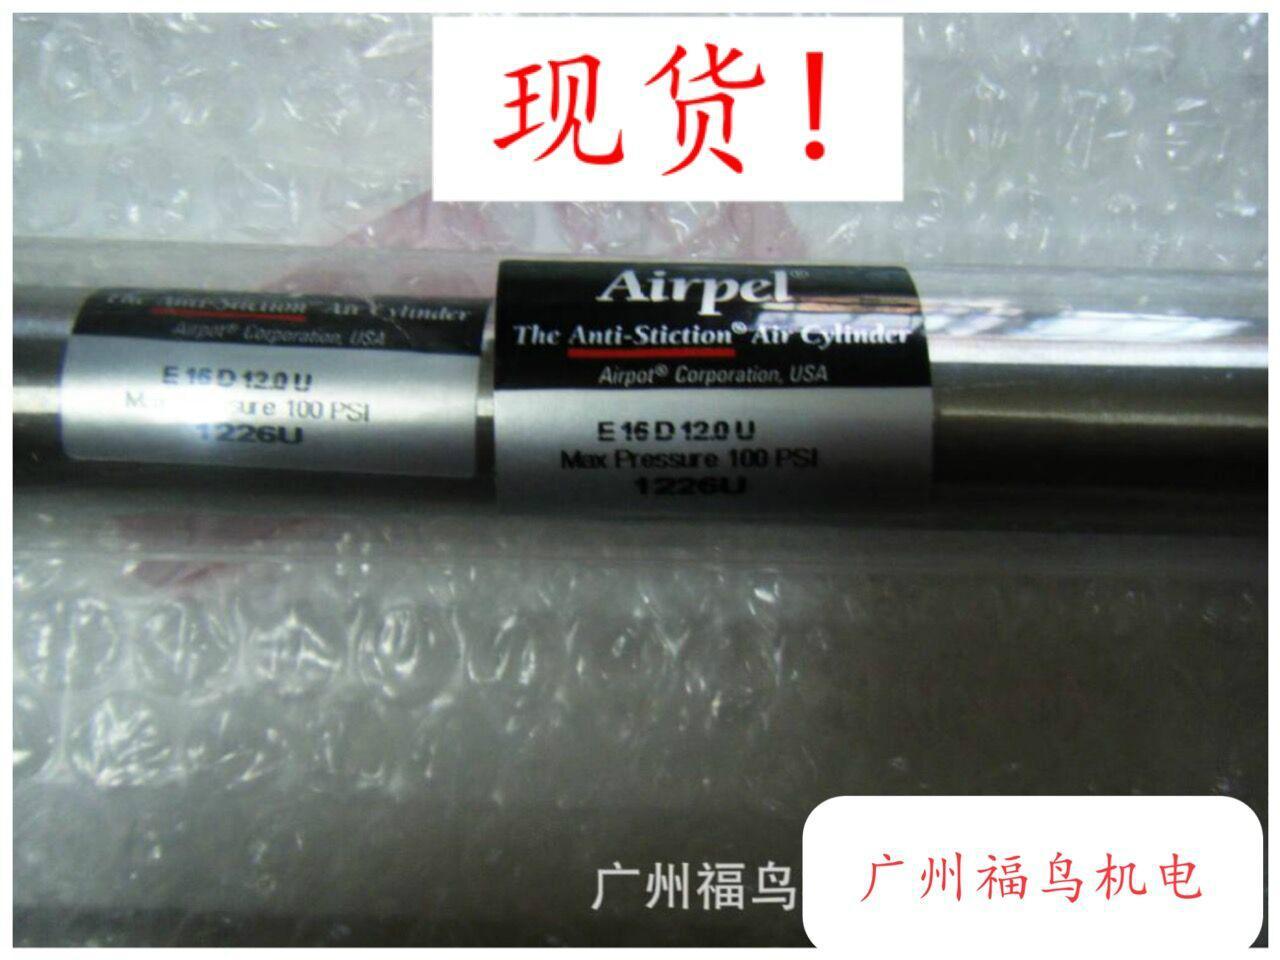 AIRPEL玻璃气缸, 型号: E16D12.0U